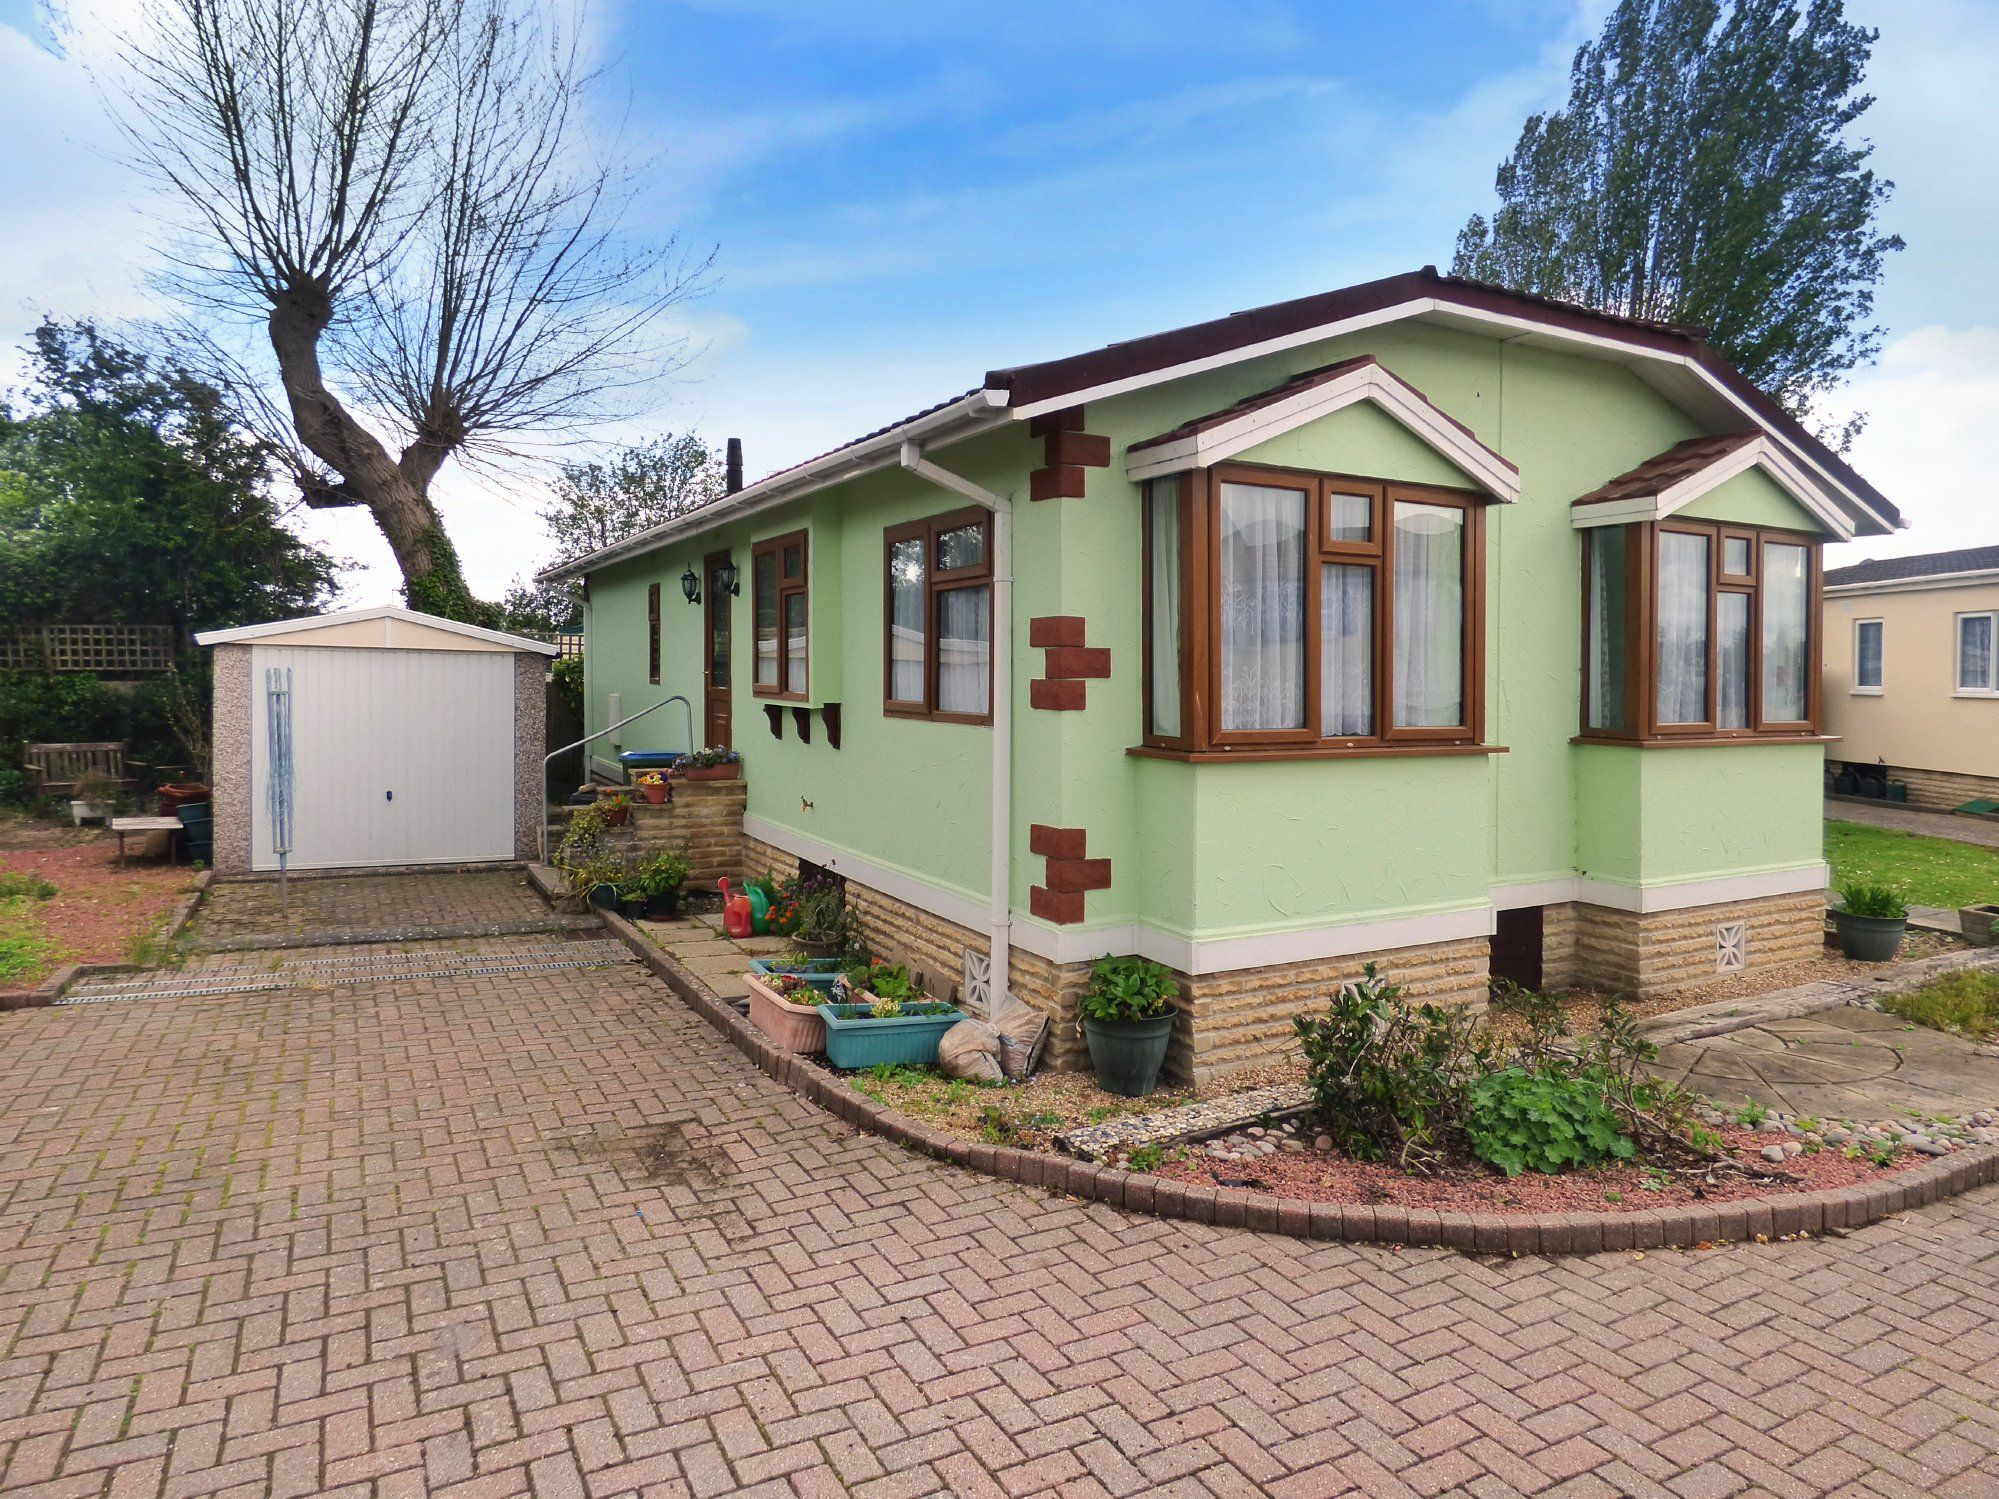 Property photo 1 of 16.